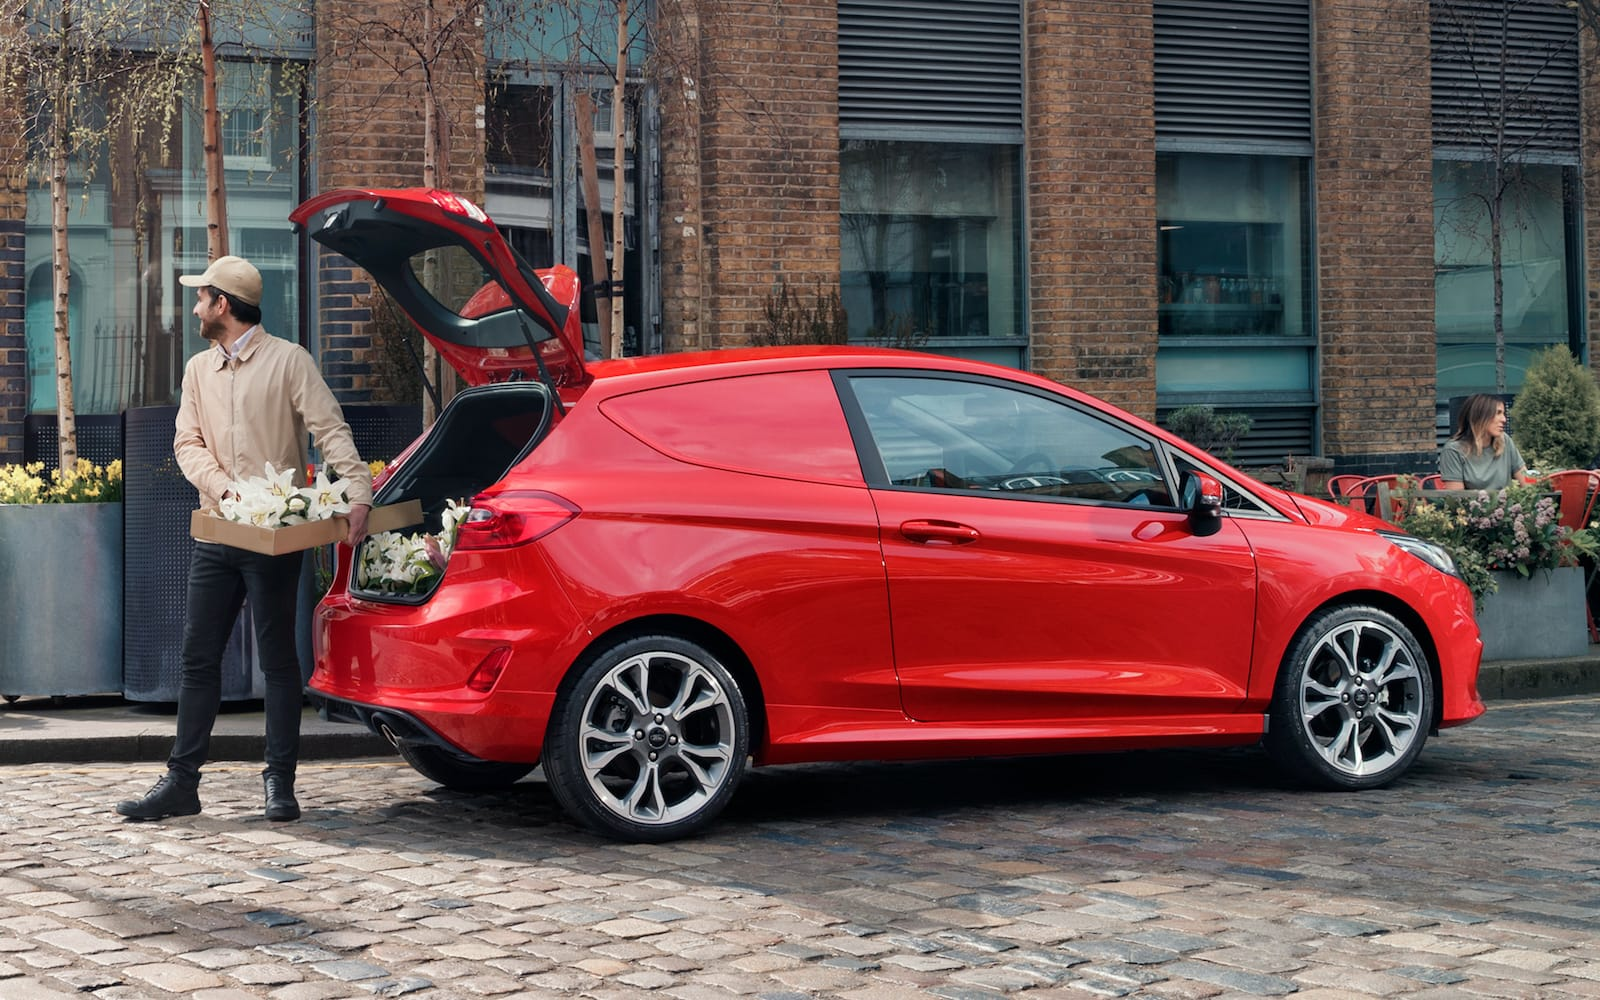 Ford-Fiesta-Sport-Van-3.jpeg.pagespeed.ce._AbnixPI0w